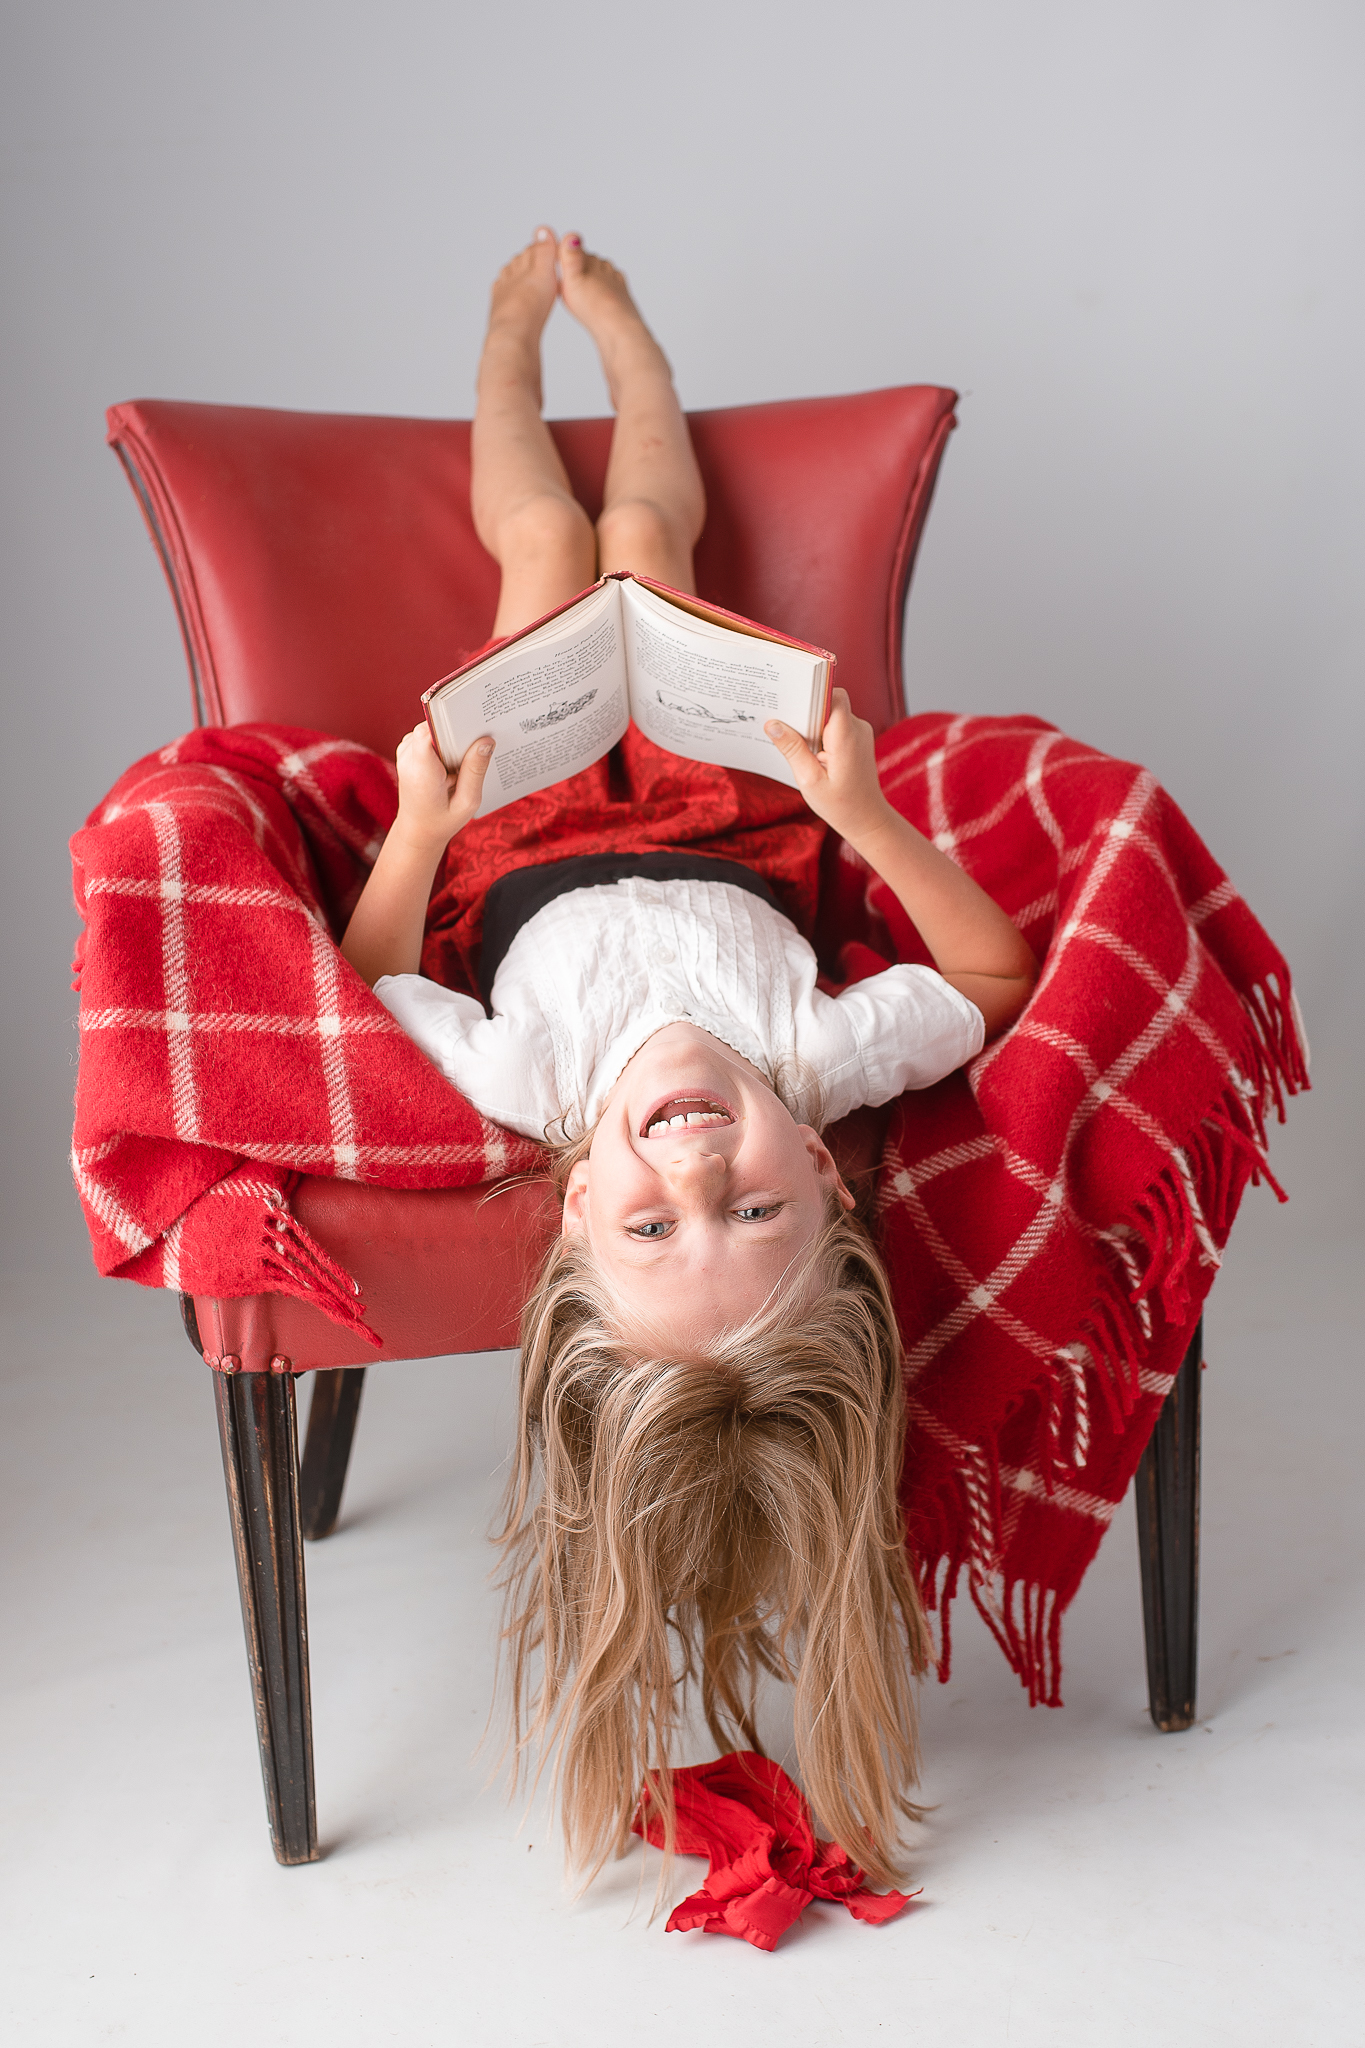 Naomi Lucienne Peterborough Photography Portrait Photography Children Photography Family Photography-5.jpg